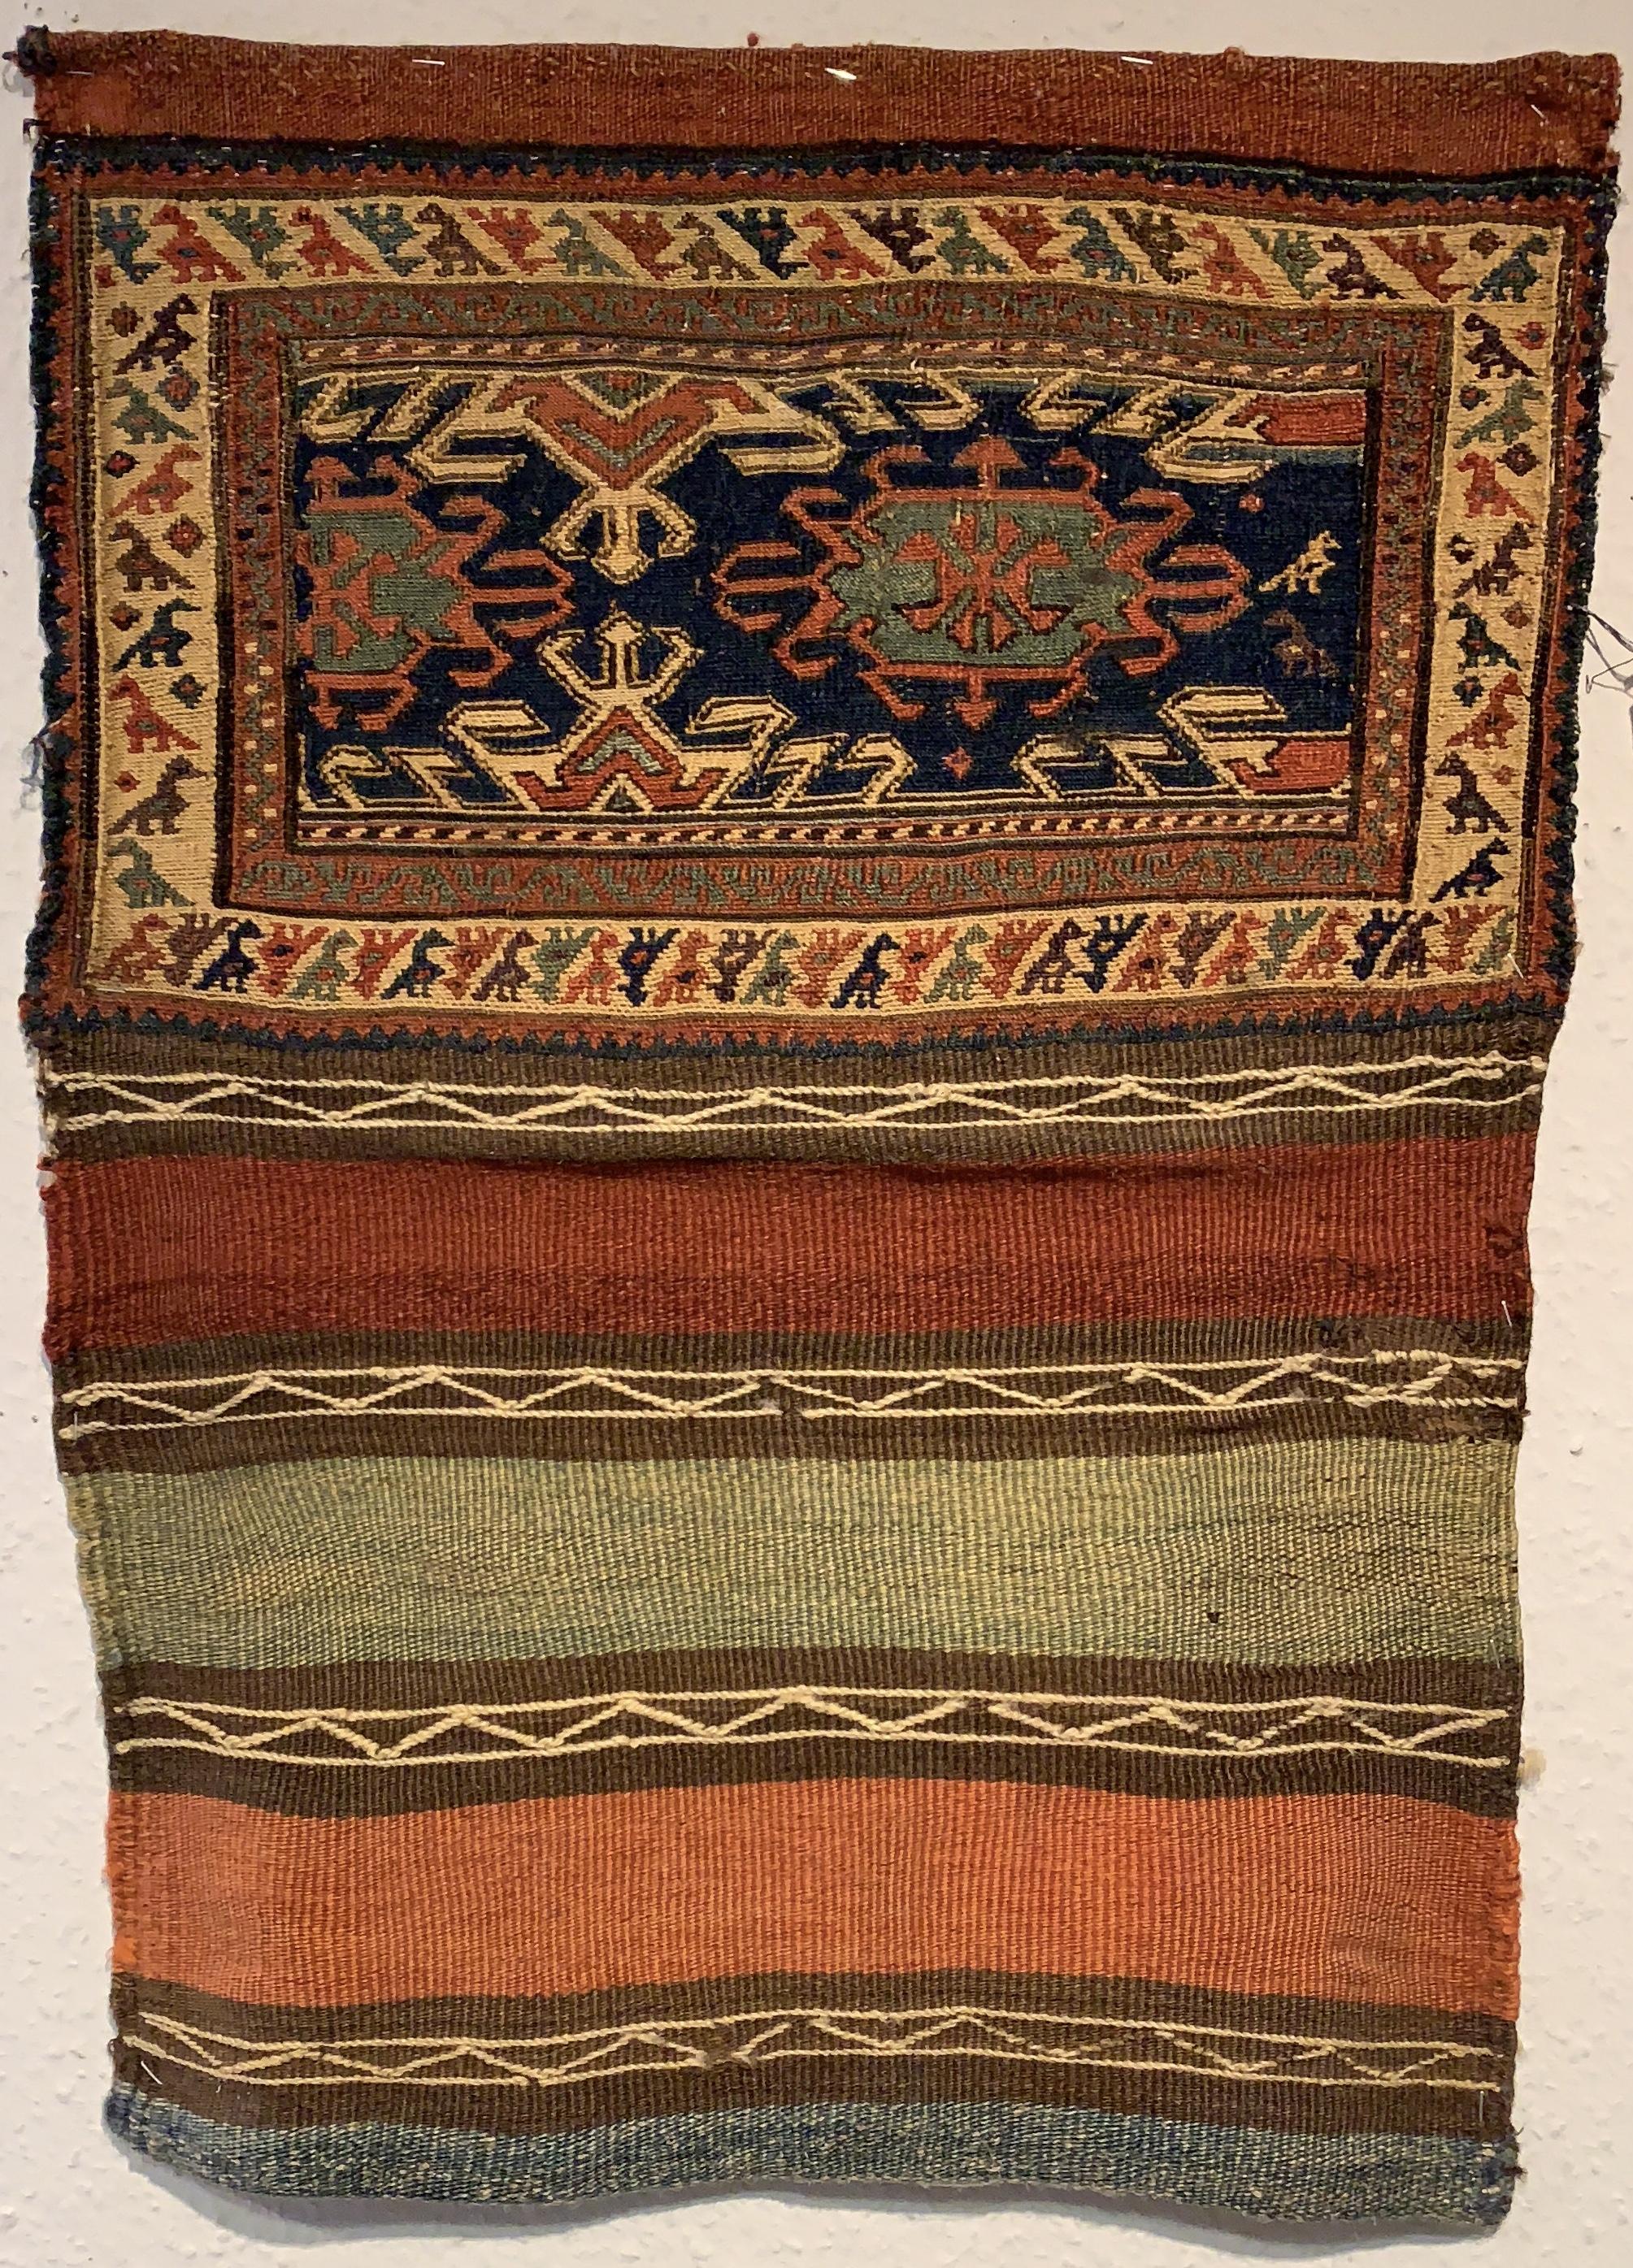 Shasavan bag